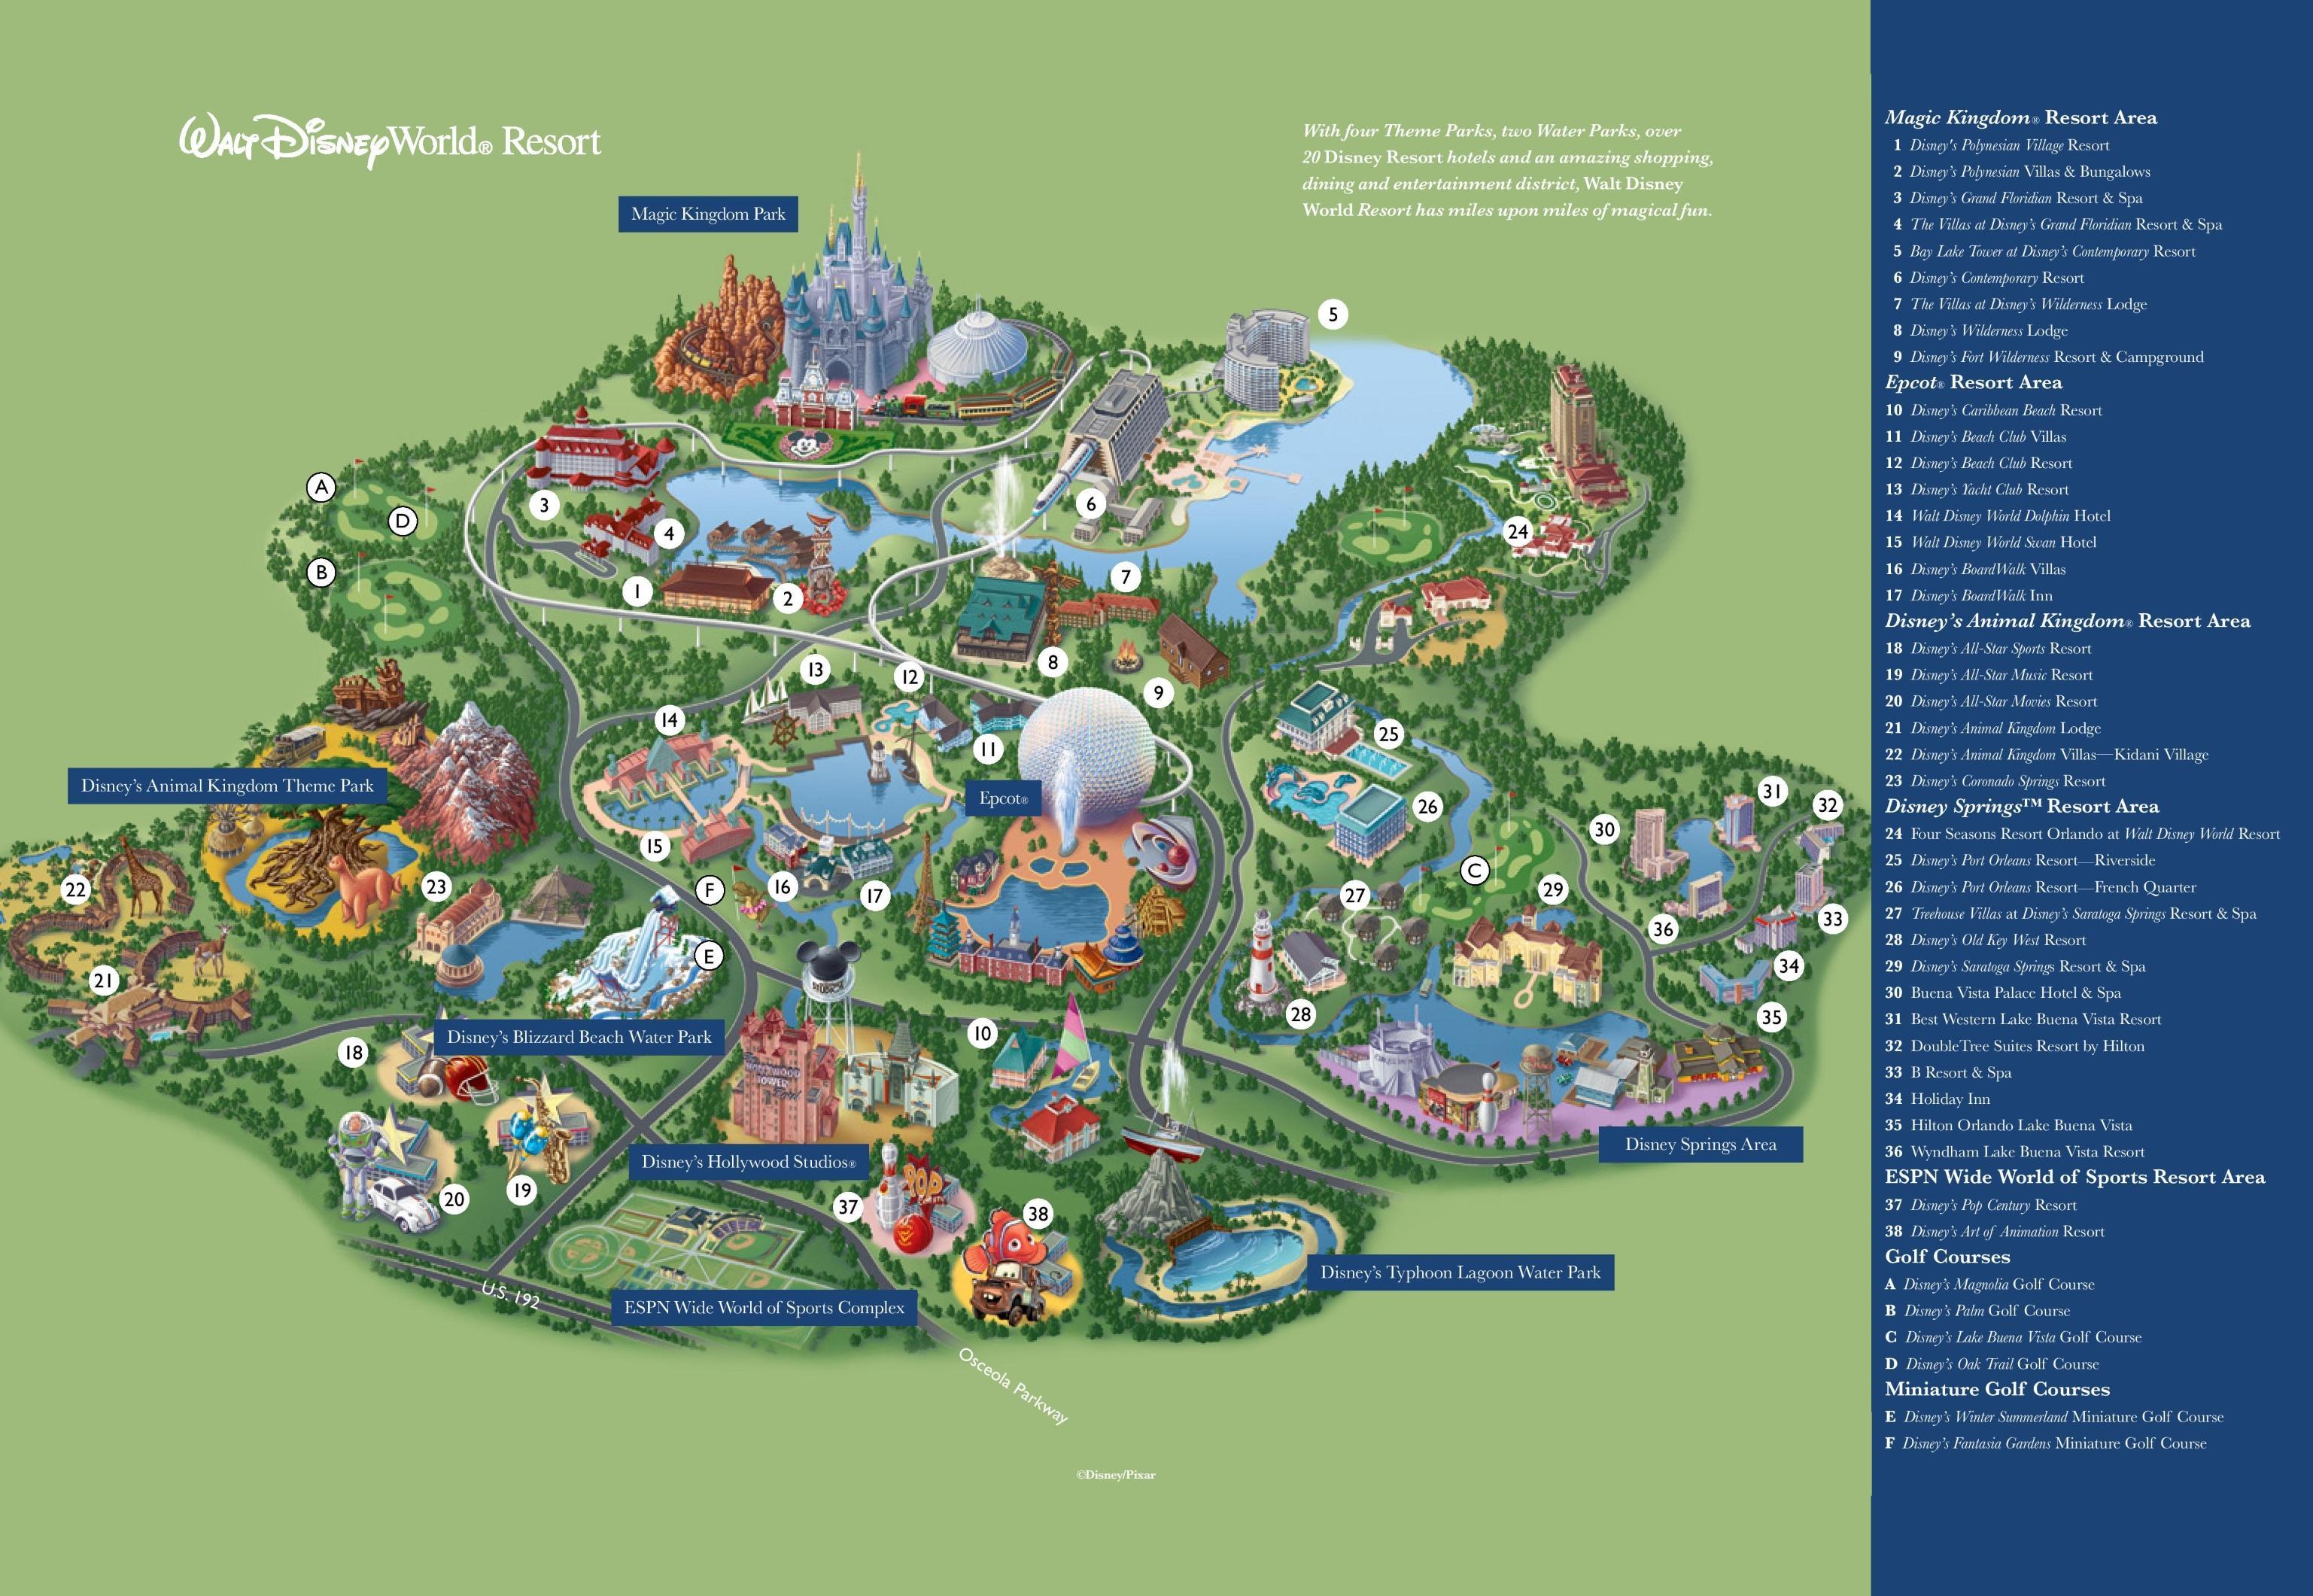 Map Of Disney World Resorts - Disney Resort Map Orlando (Florida - Usa) - Florida Resorts Map